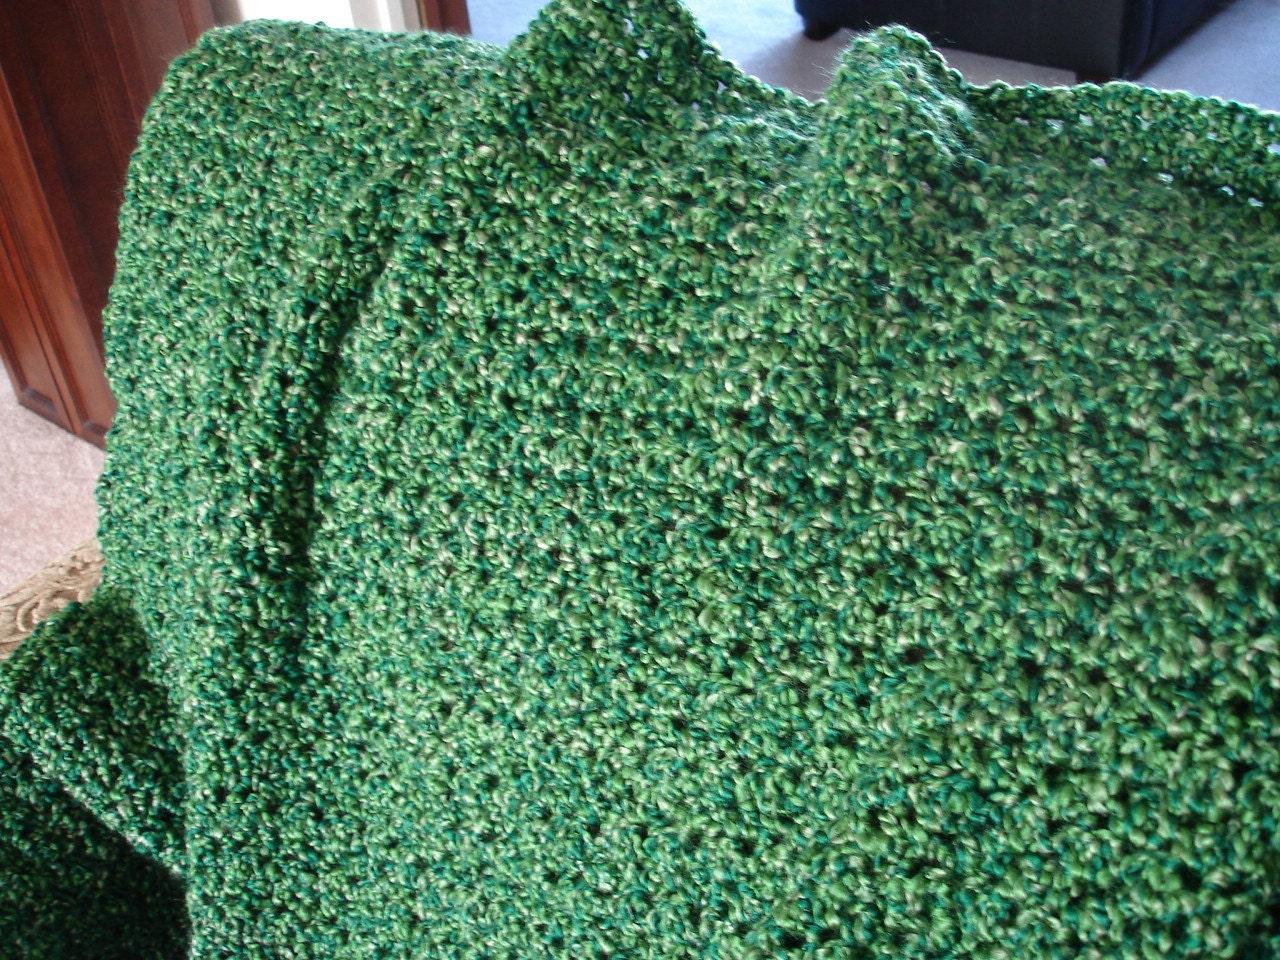 Emerald grass green afghan throw blanket - Emerald green throw blanket ...